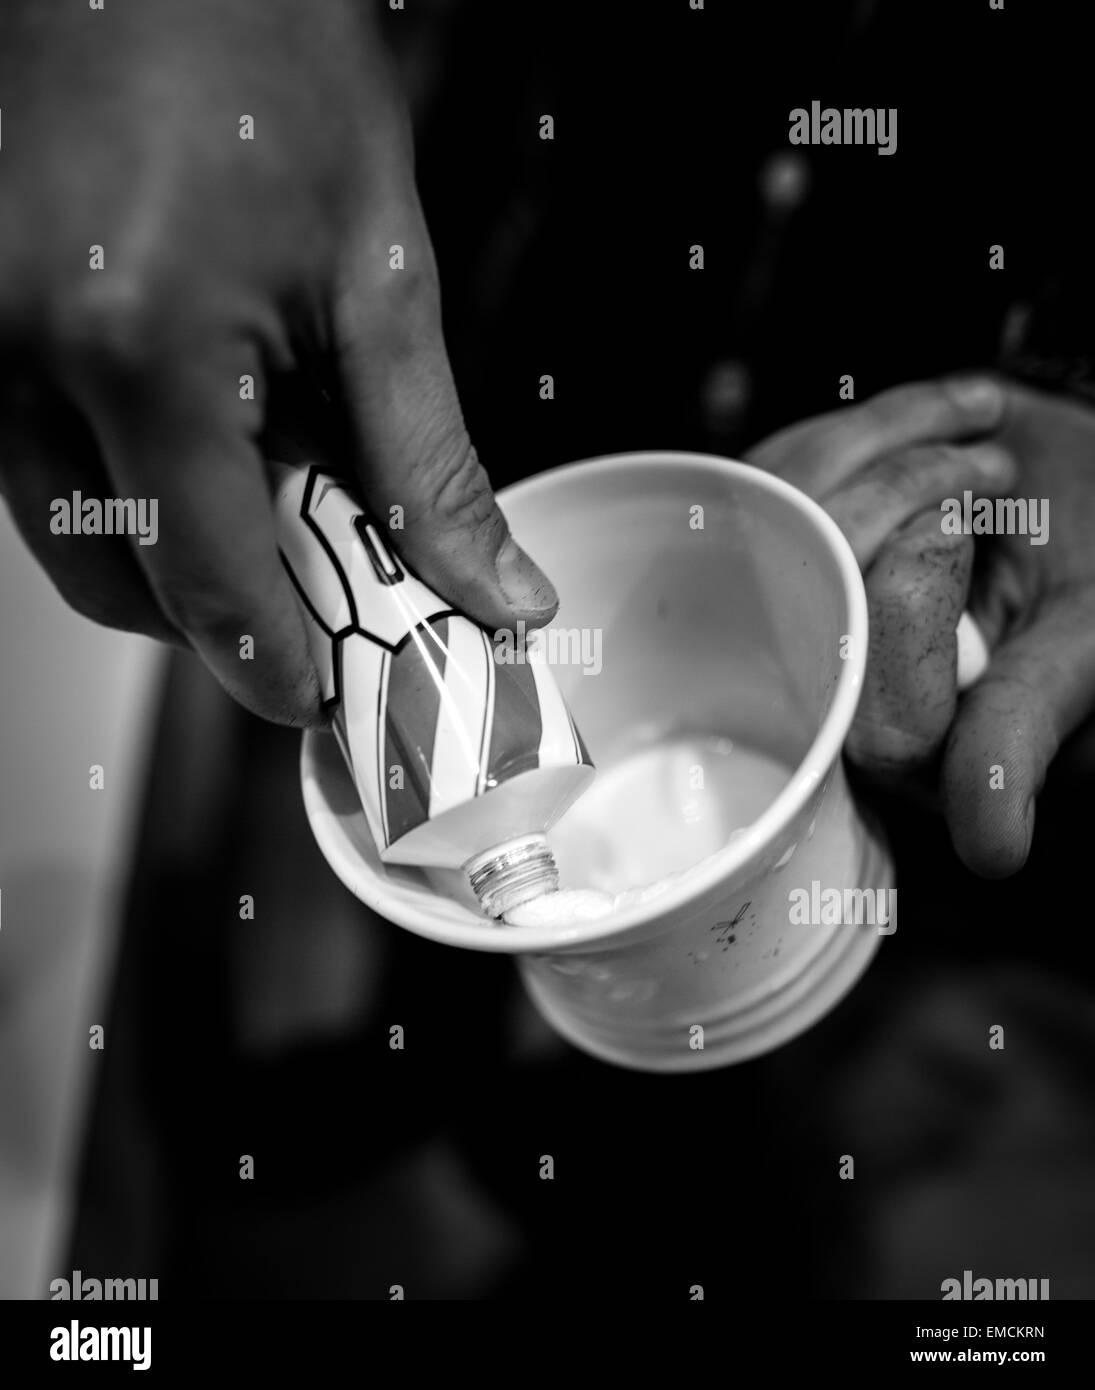 Man's hand pressing tube of shaving cream - Stock Image